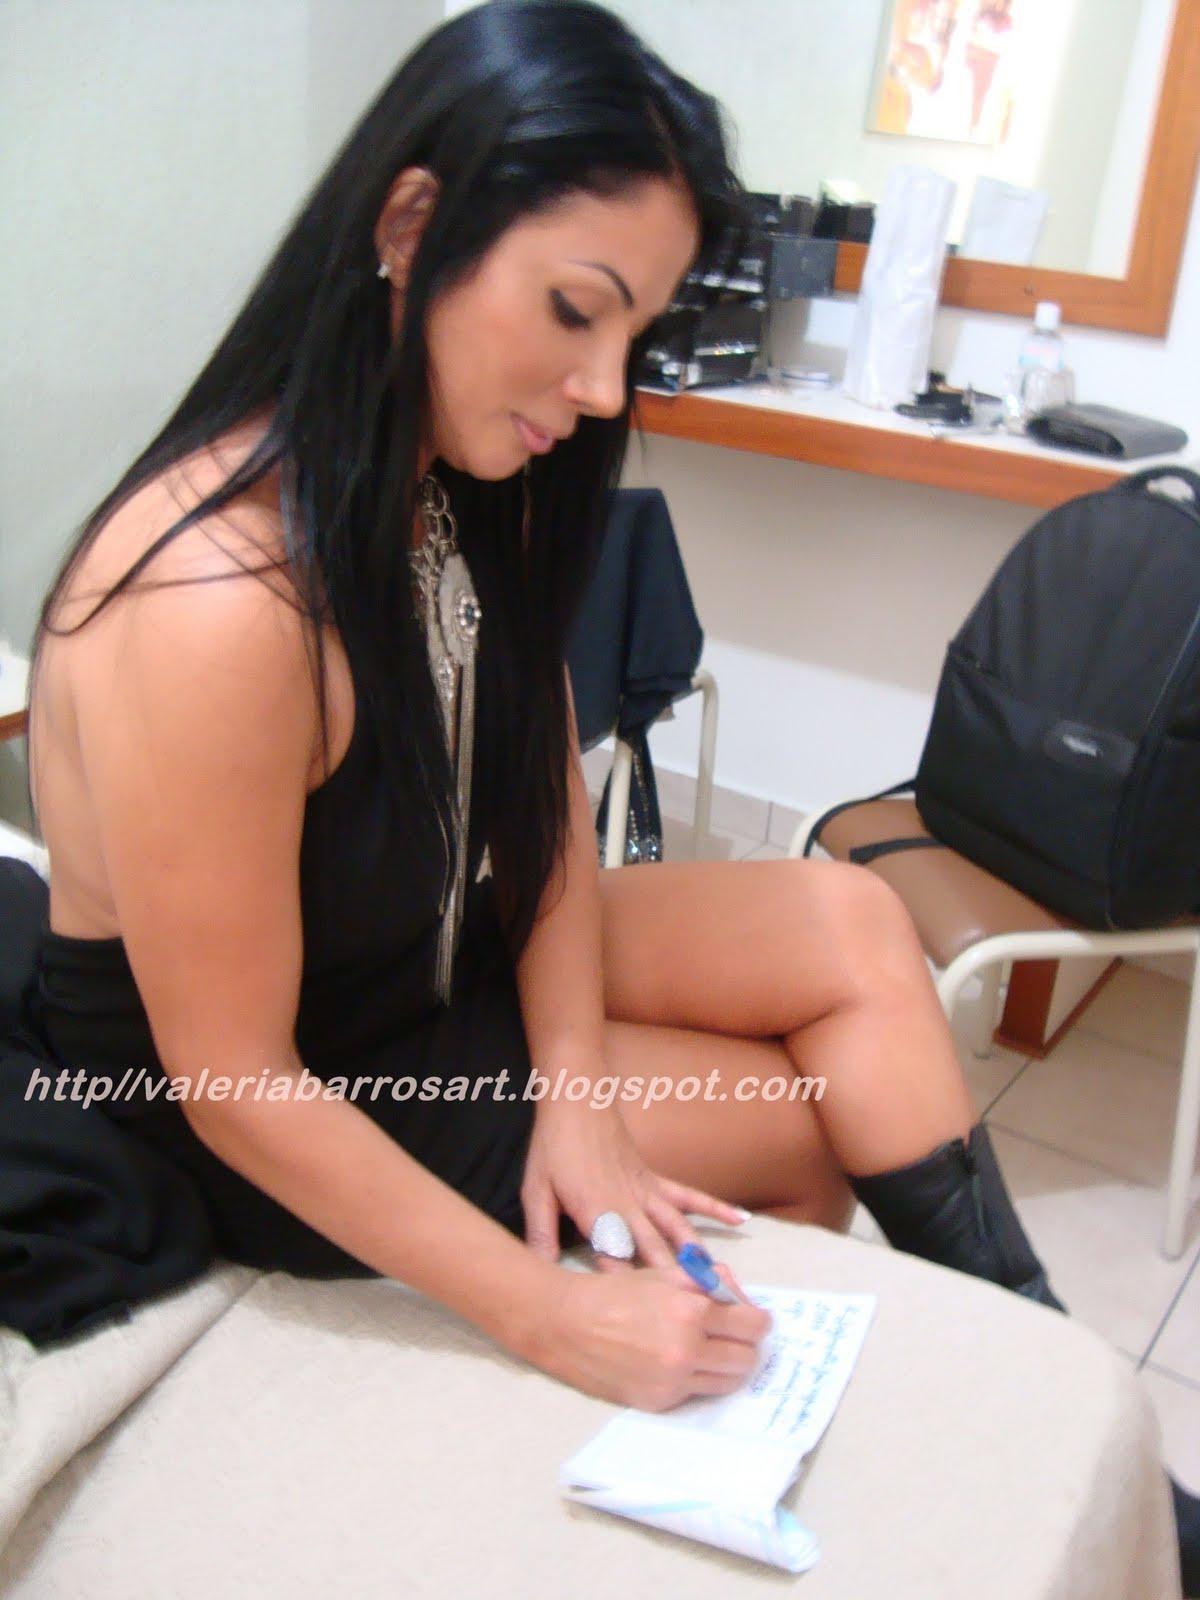 http://3.bp.blogspot.com/_zseE_q6H7YY/S7lCUQtqNmI/AAAAAAAAAO4/zDgydyly5HE/s1600/04.03.10+053.jpg